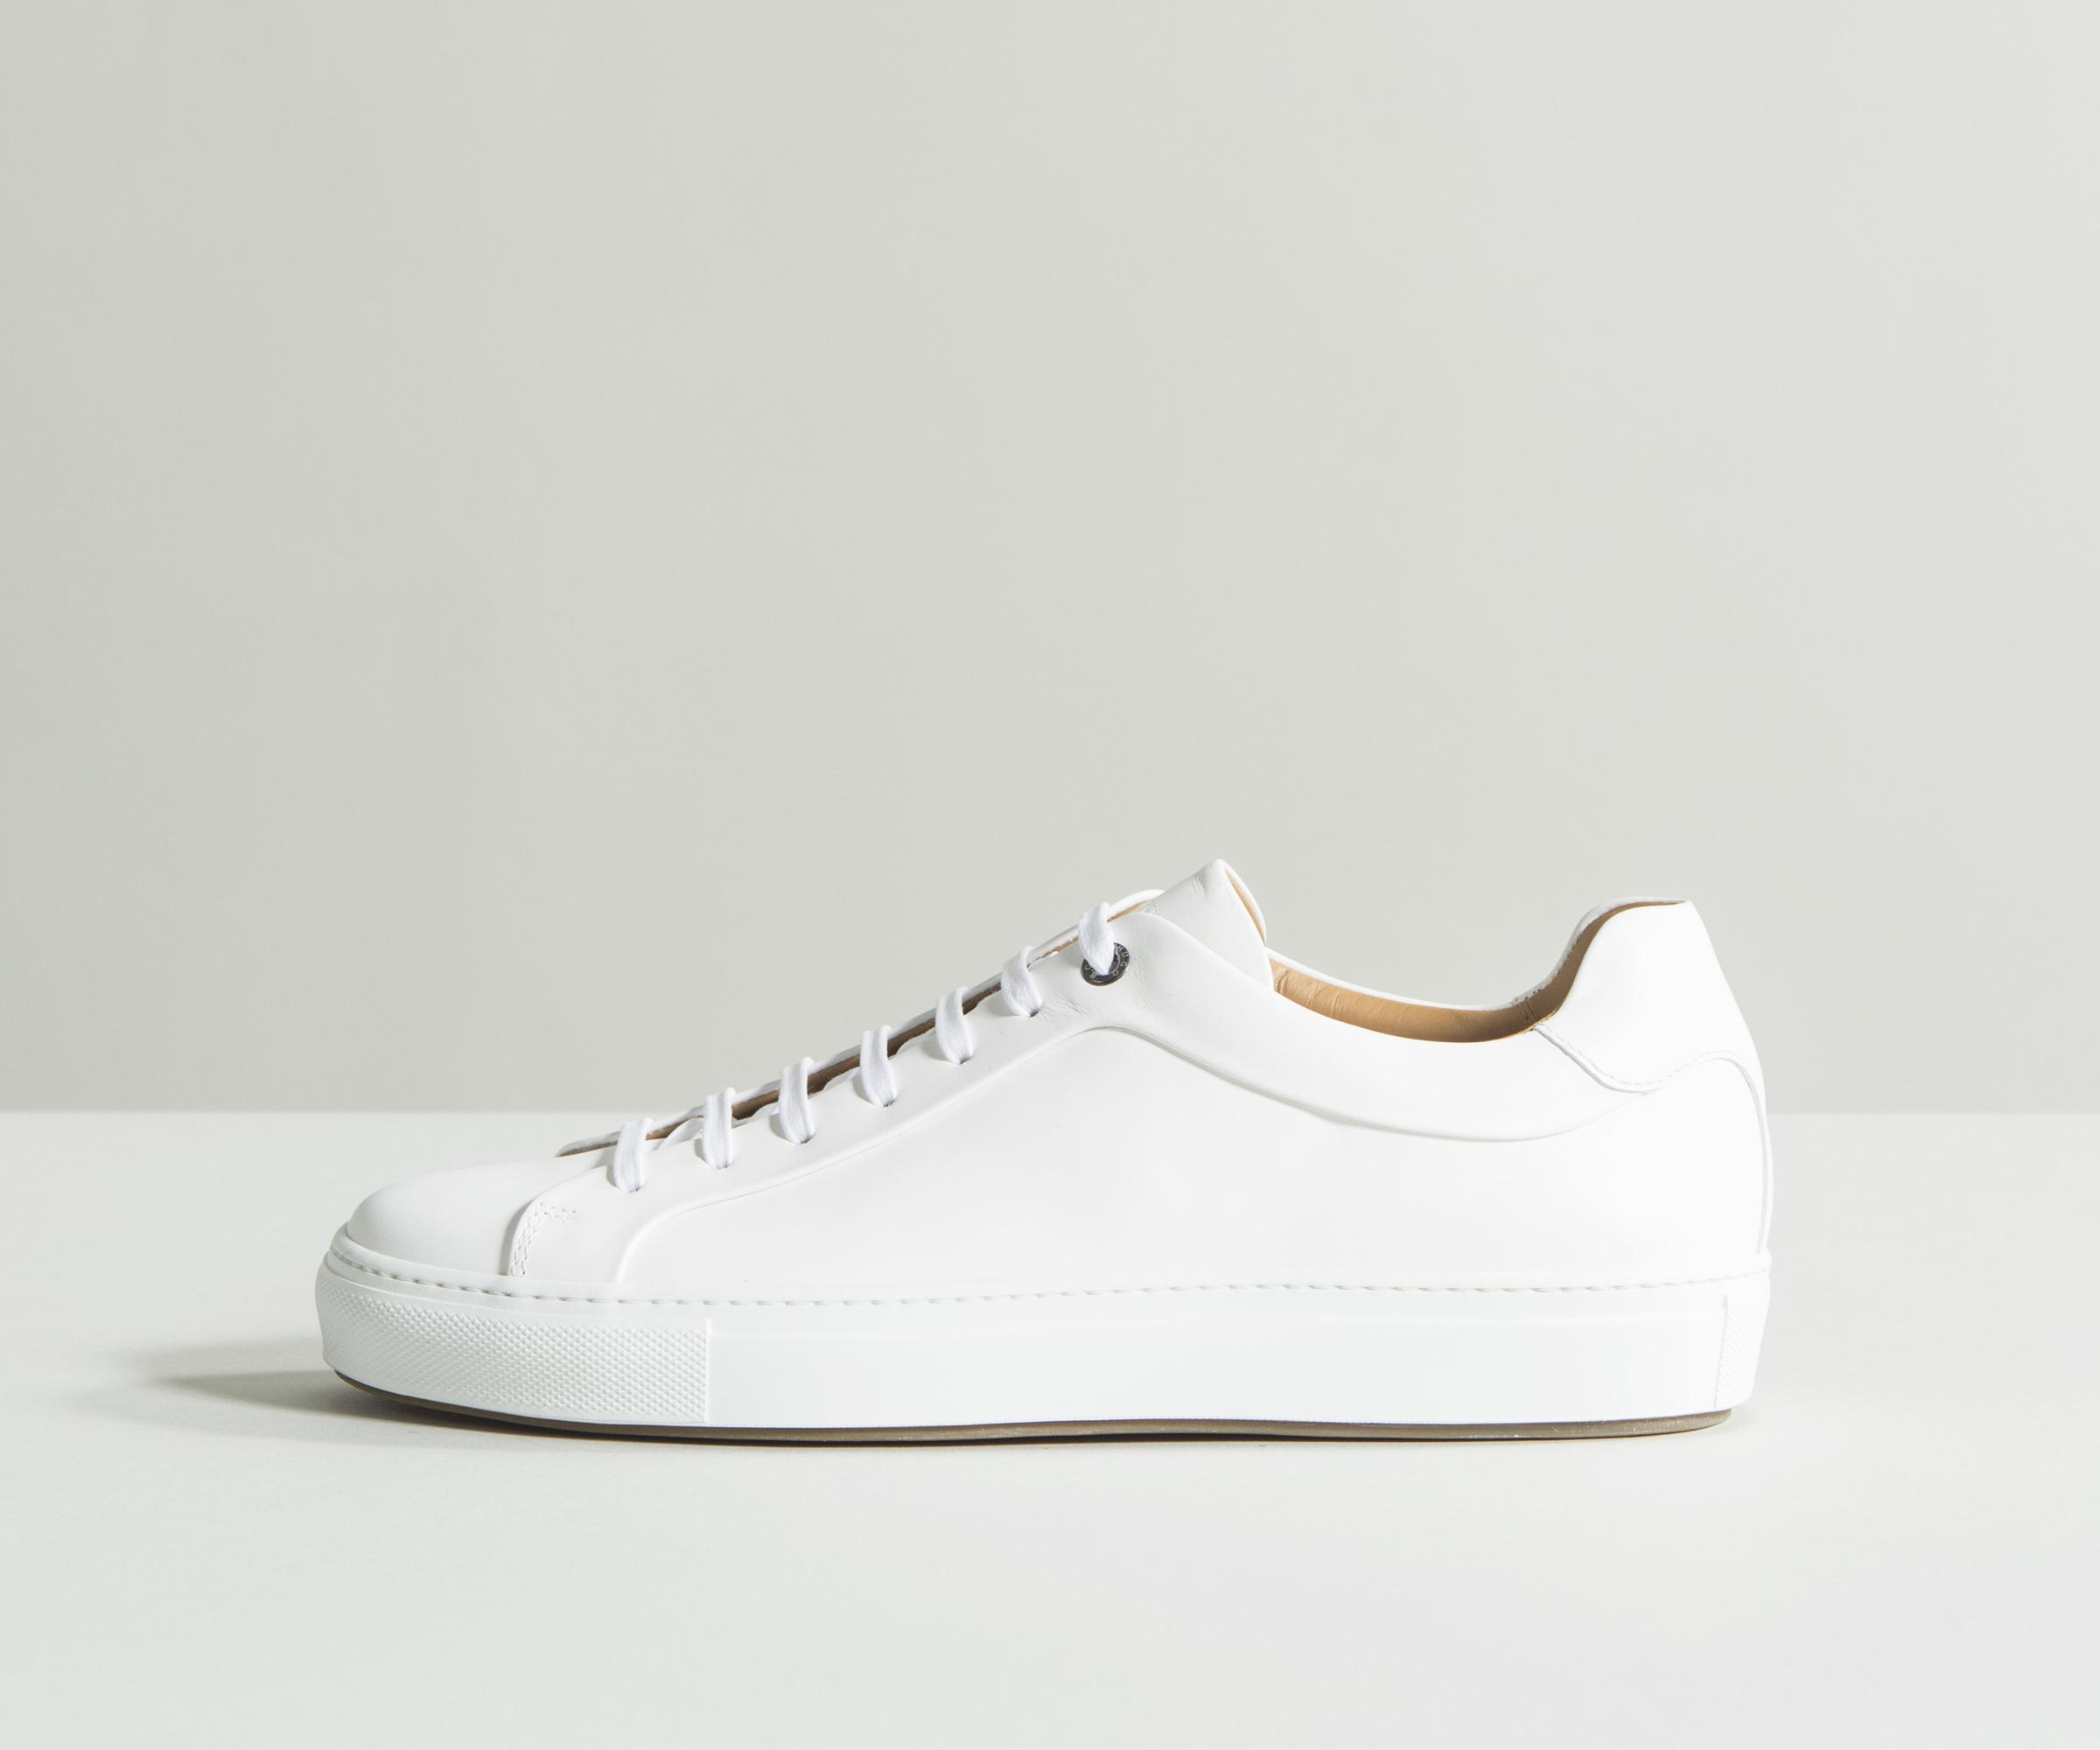 Mirage Burnished-leather Sneakers HUGO BOSS lB42BlIv